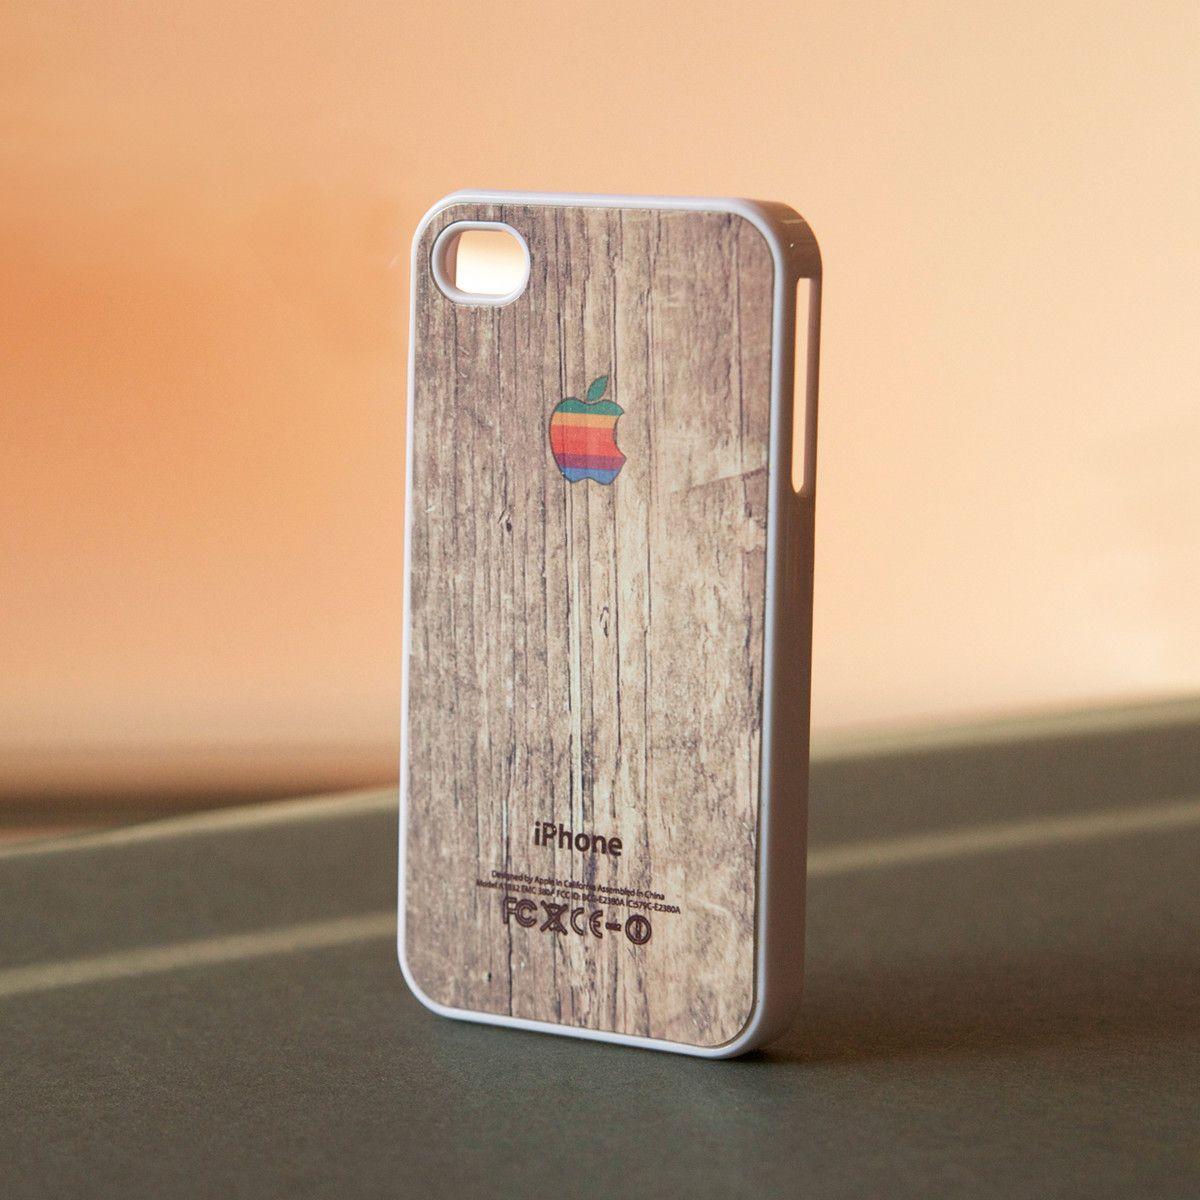 Apple Logo iPhone 4/4S Case